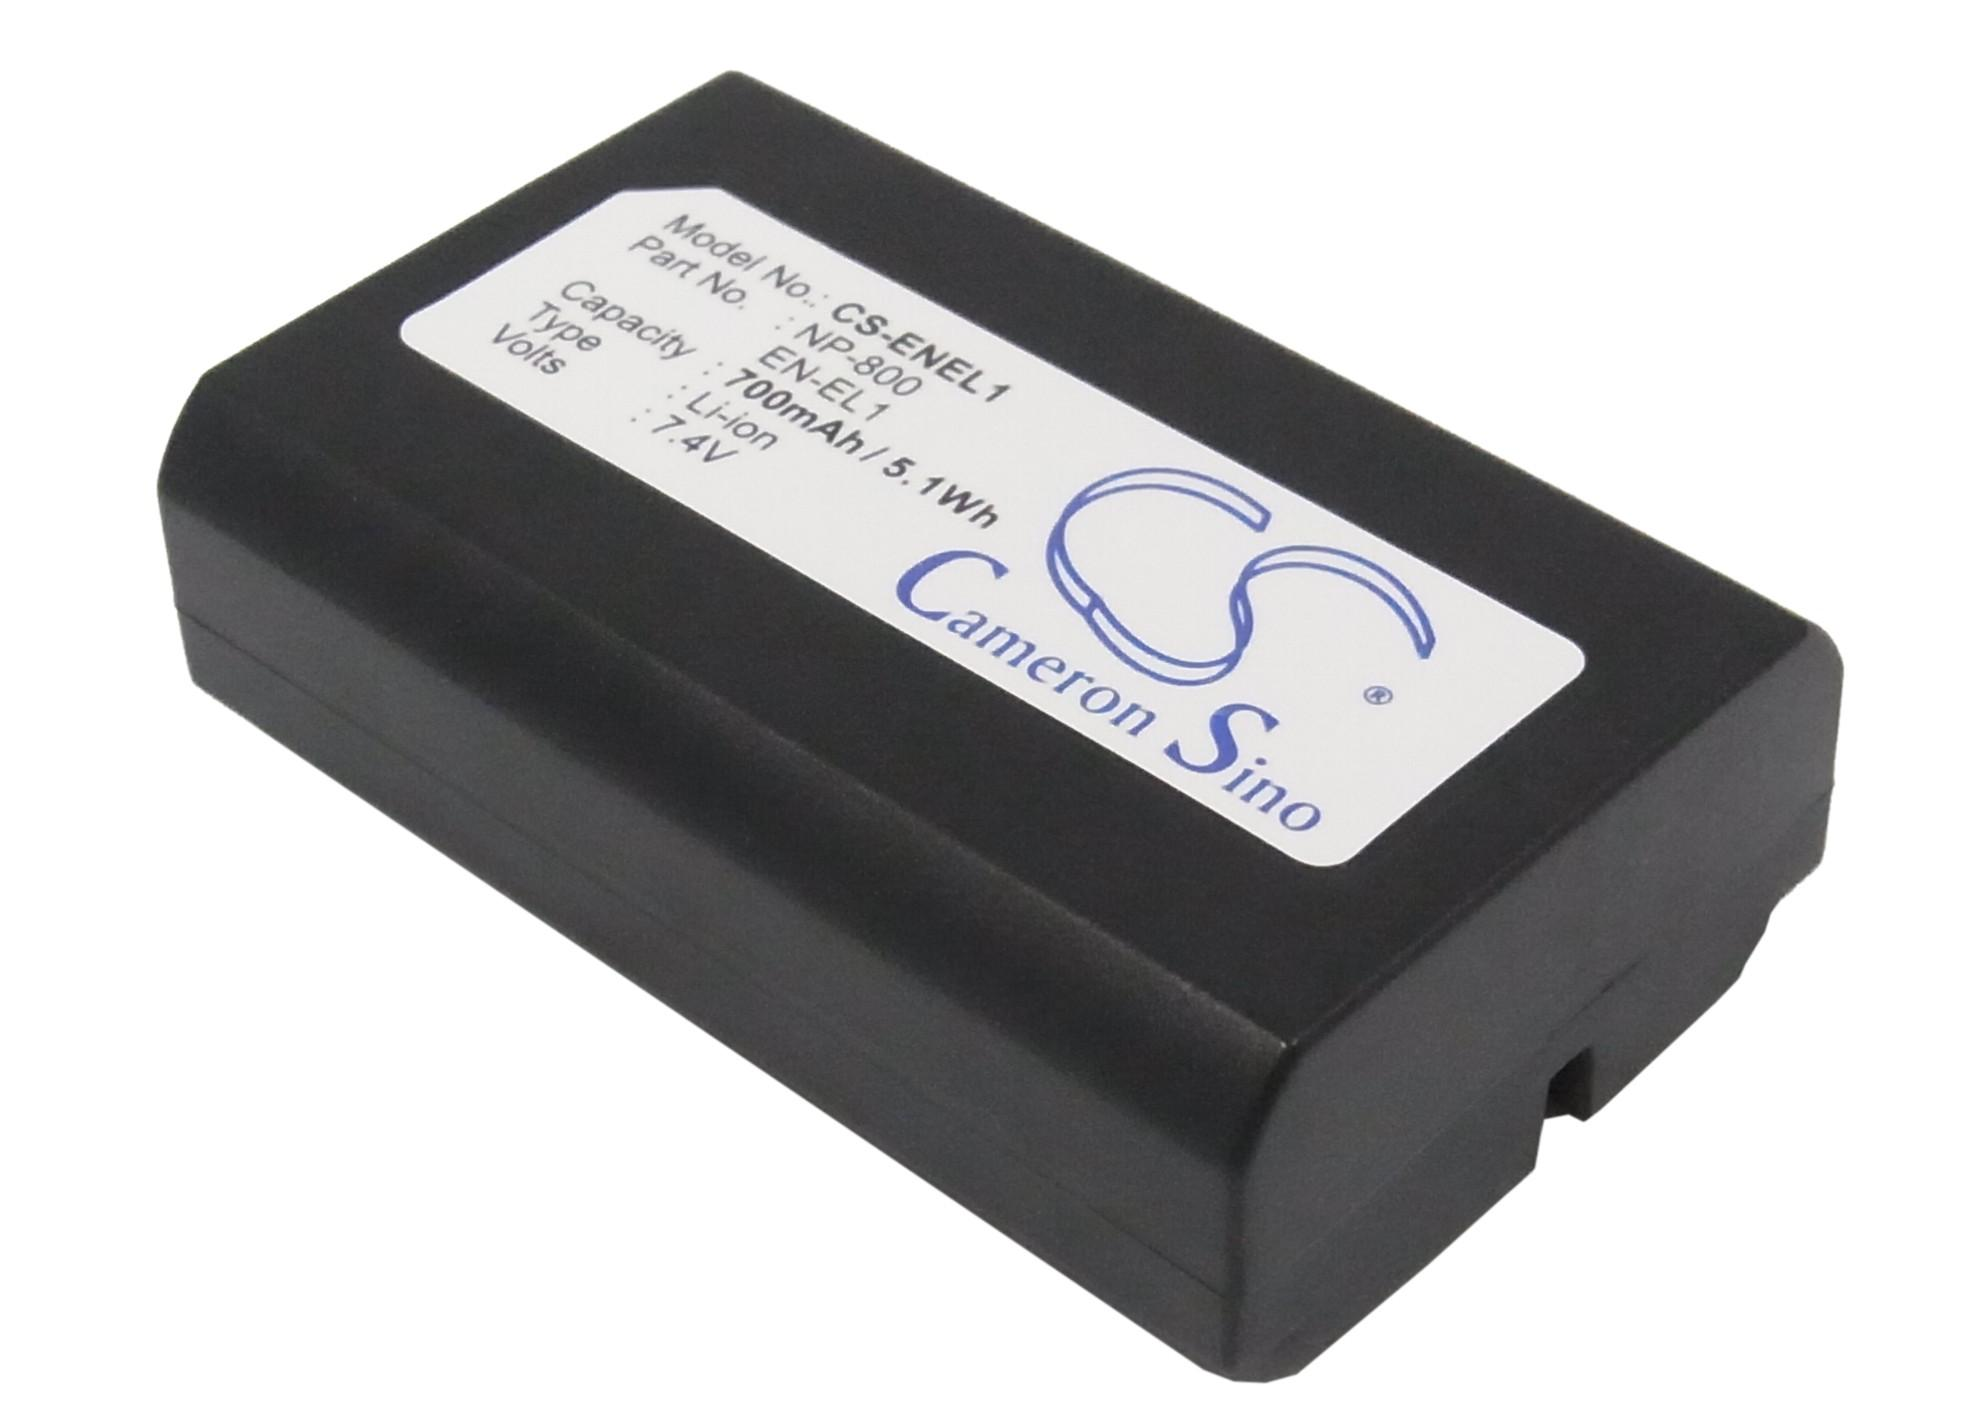 Батерия за апарат NIKON EN-EL1 /Minolta NP800 / LiIon 7.4V 700mAh Cameron Sino